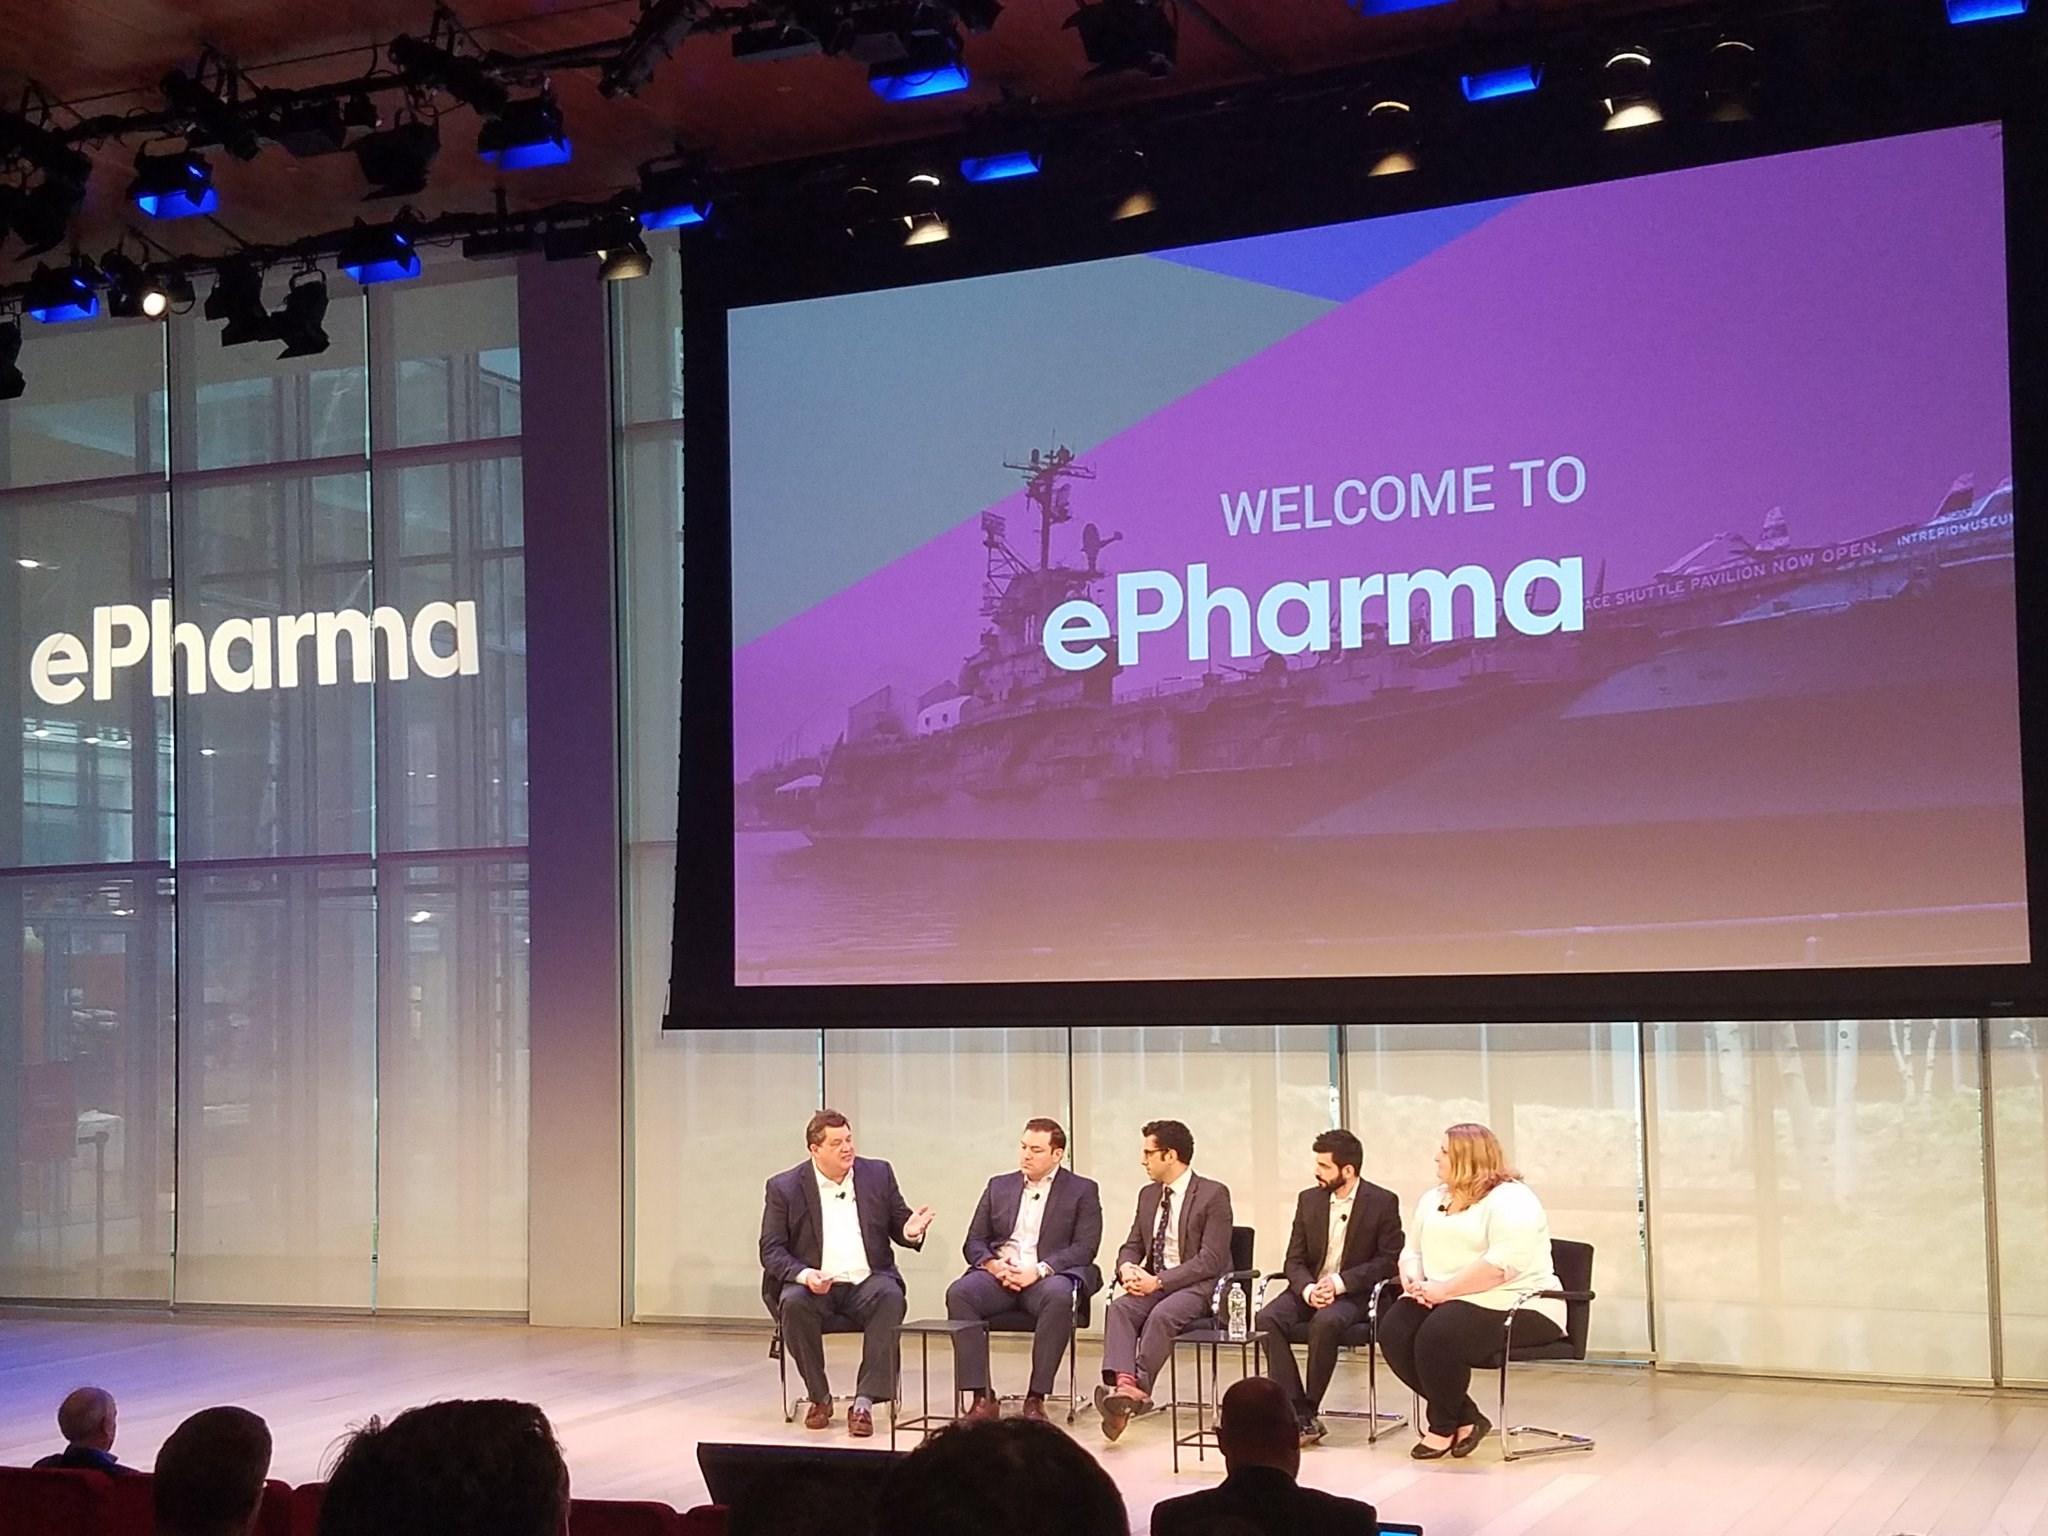 Doctors seek more transparency from drugmakers: ePharma panel